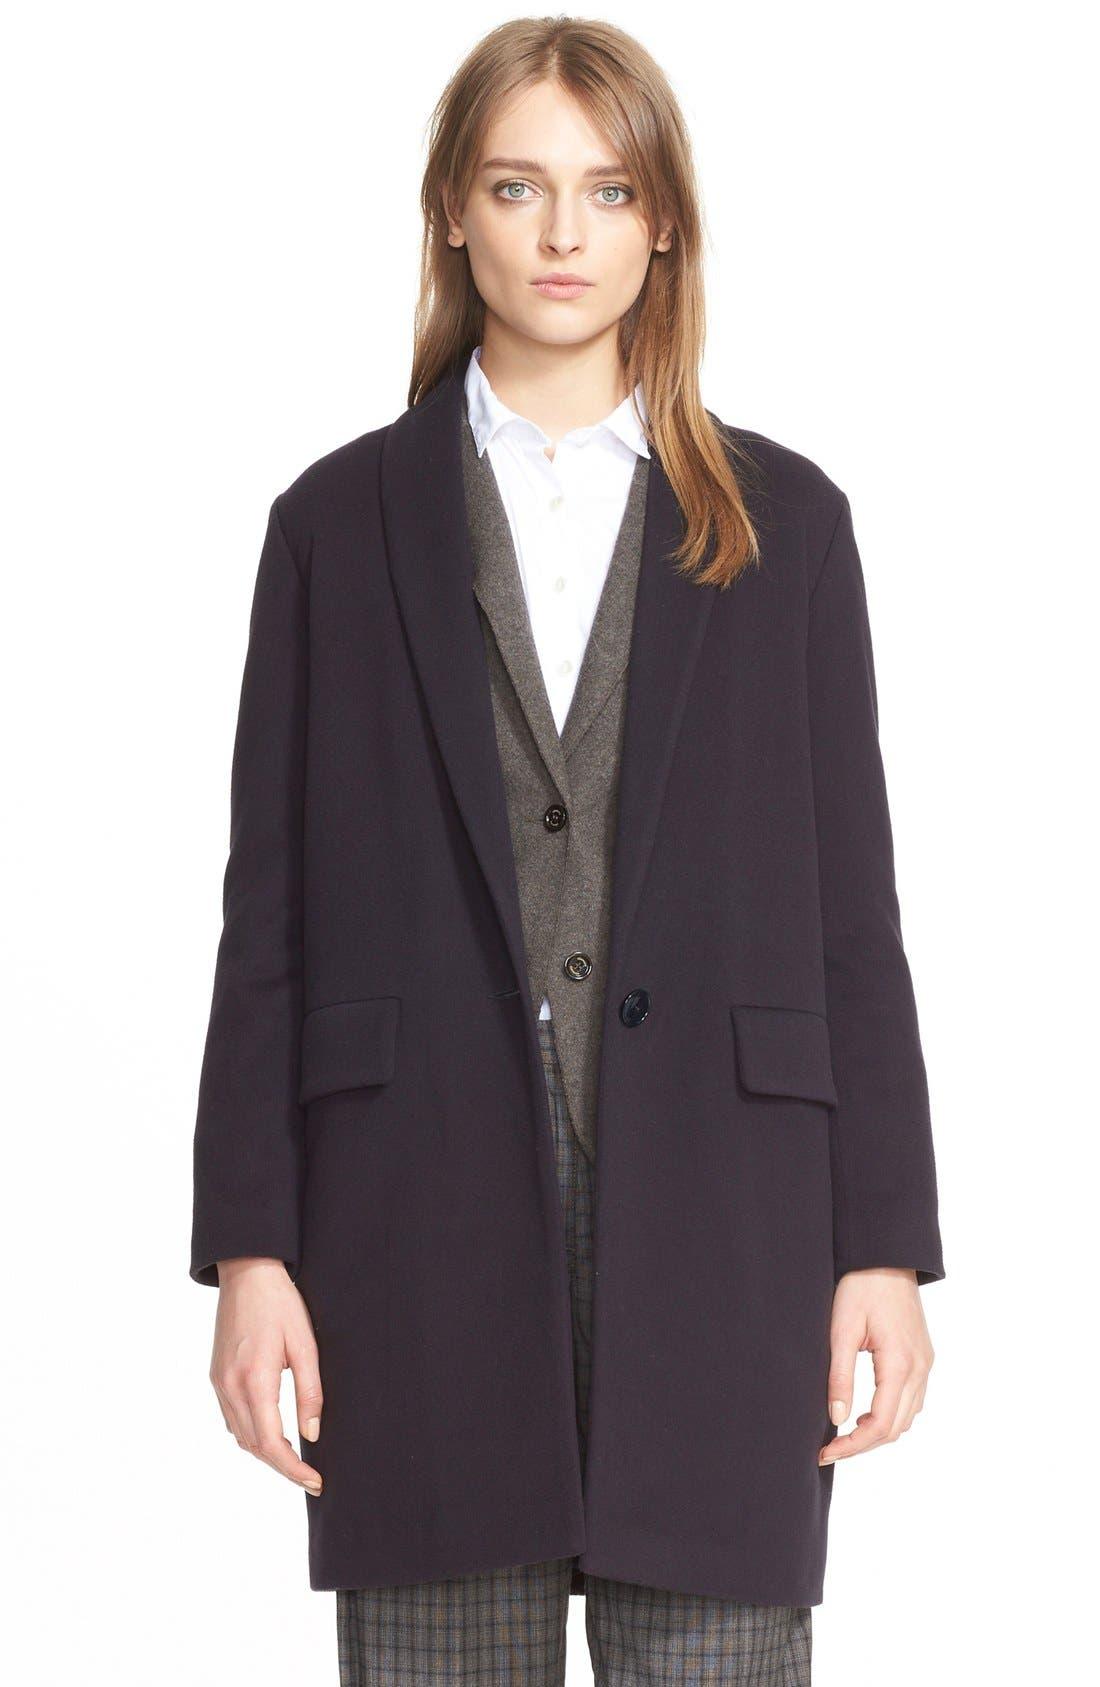 Main Image - Eleventy Houndstooth Wool Coat